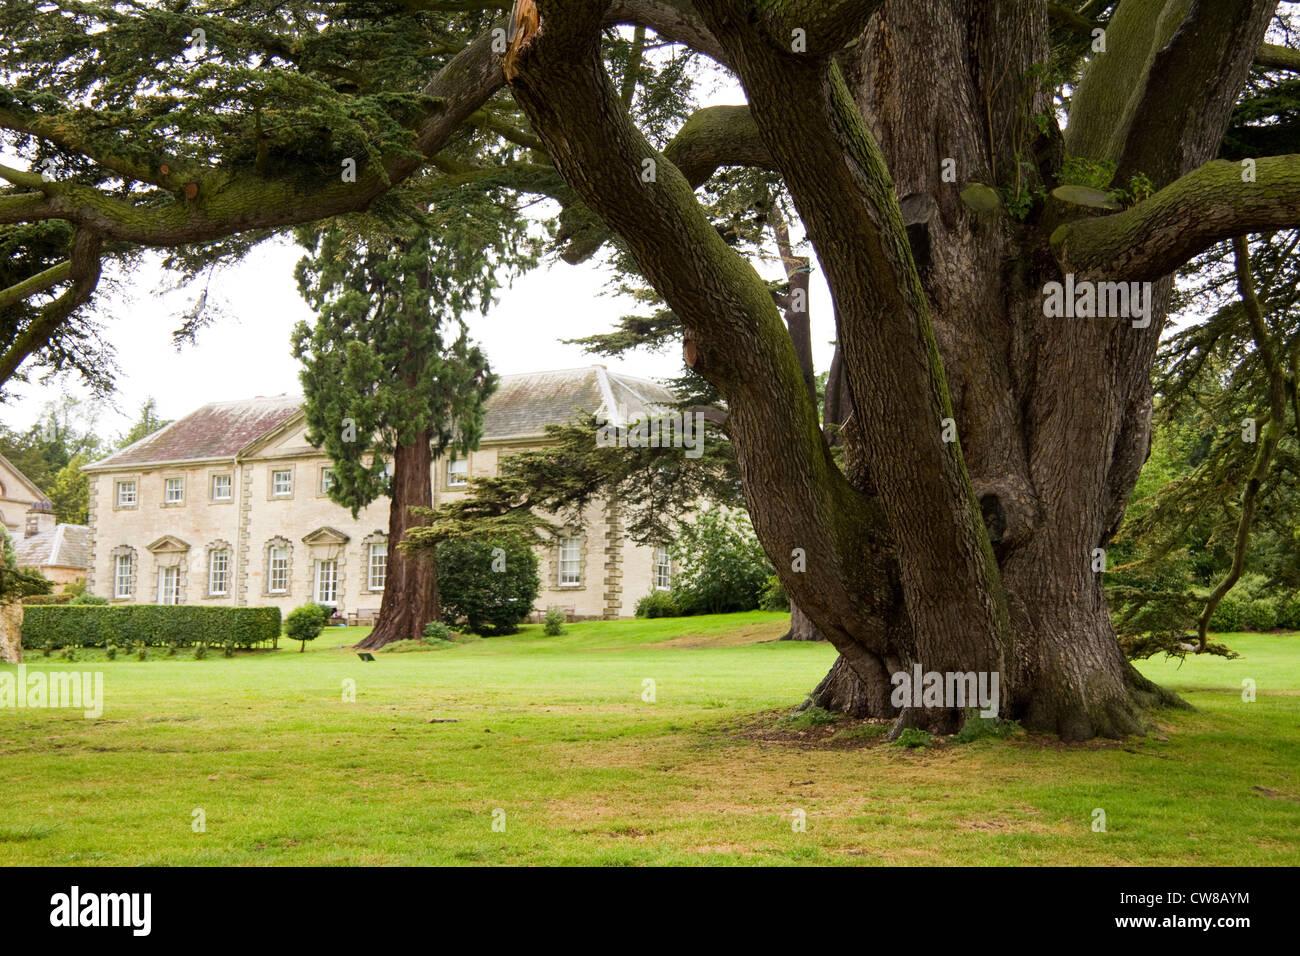 Compton Verney House Warwickshire, England - Stock Image